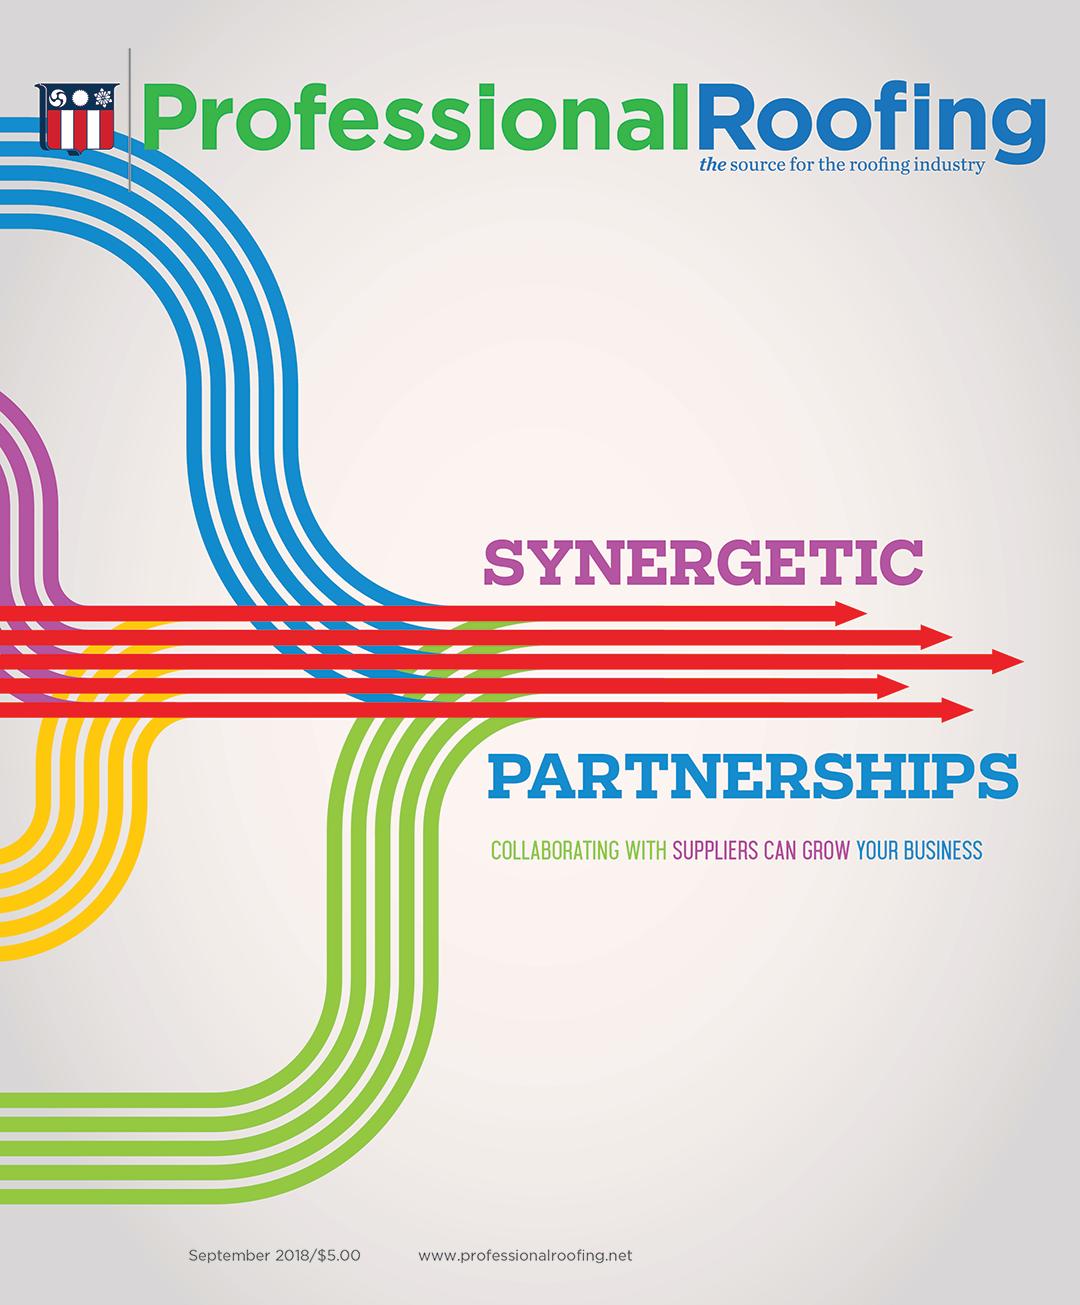 Professional Roofing Magazine 9/1/2018